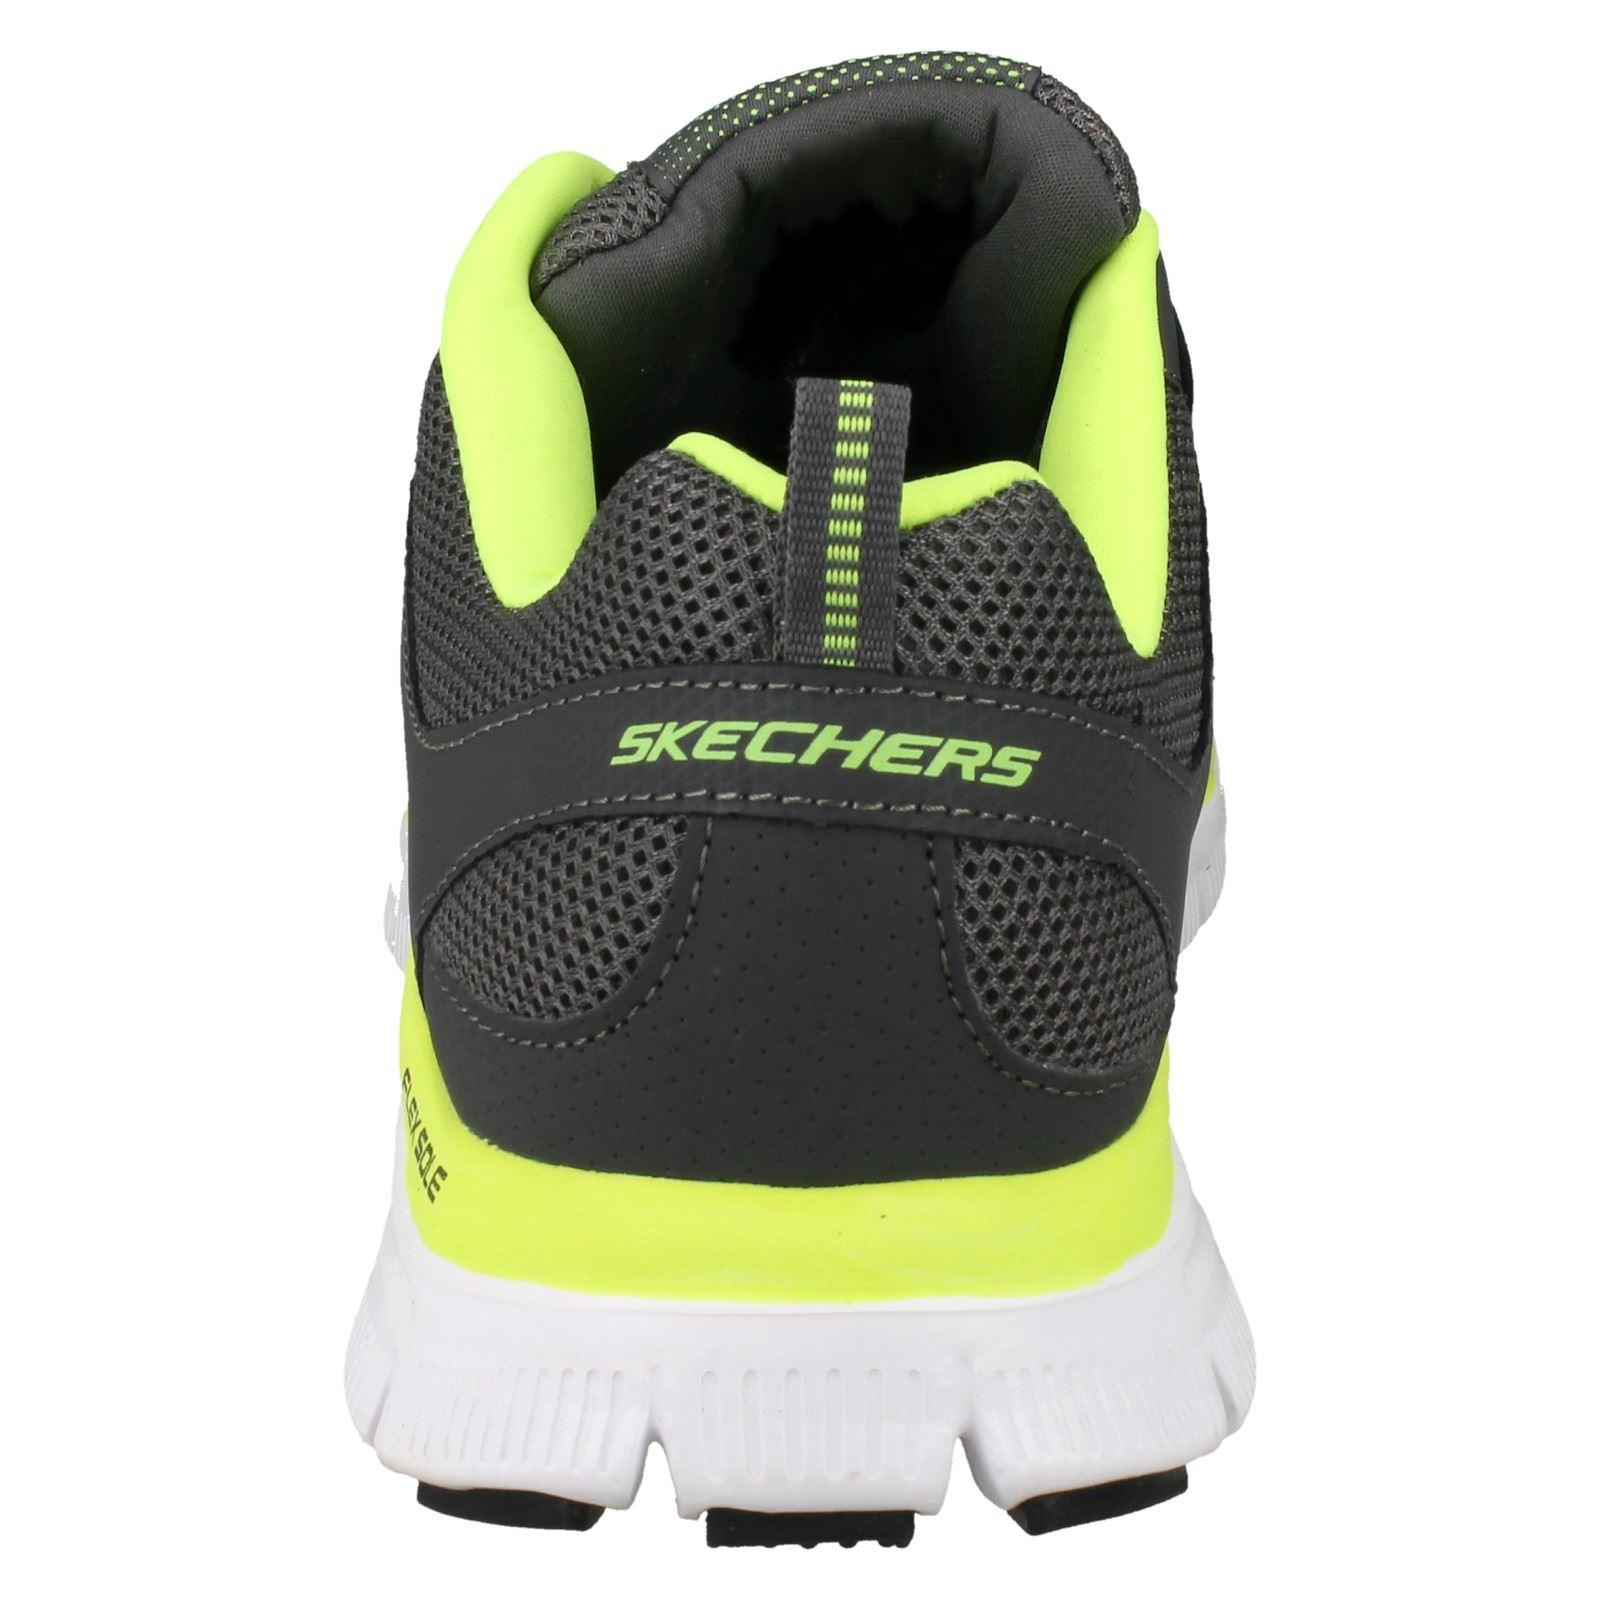 Da Uomo Skechers Skechers Skechers Memory Foam Scarpe da ginnastica